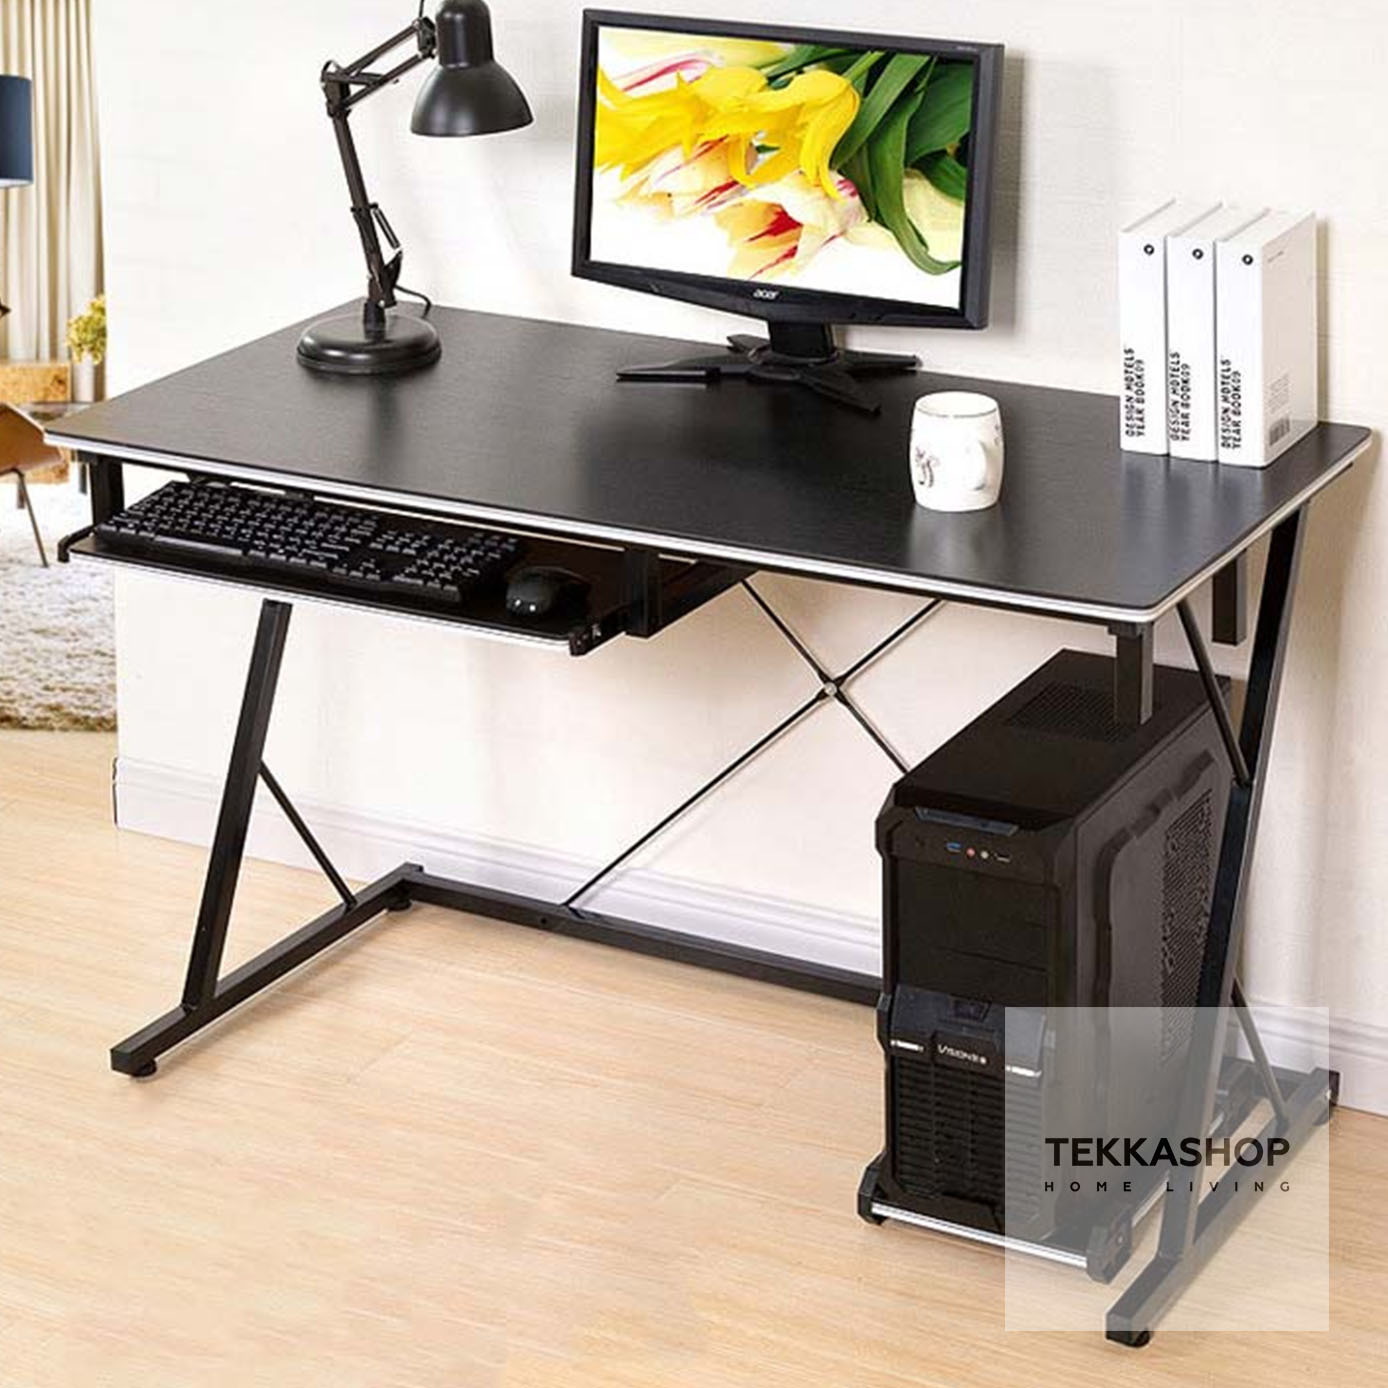 Tekka Gdcd1709bl Modern Wooden Computer Table Workstation Study Desk Blac